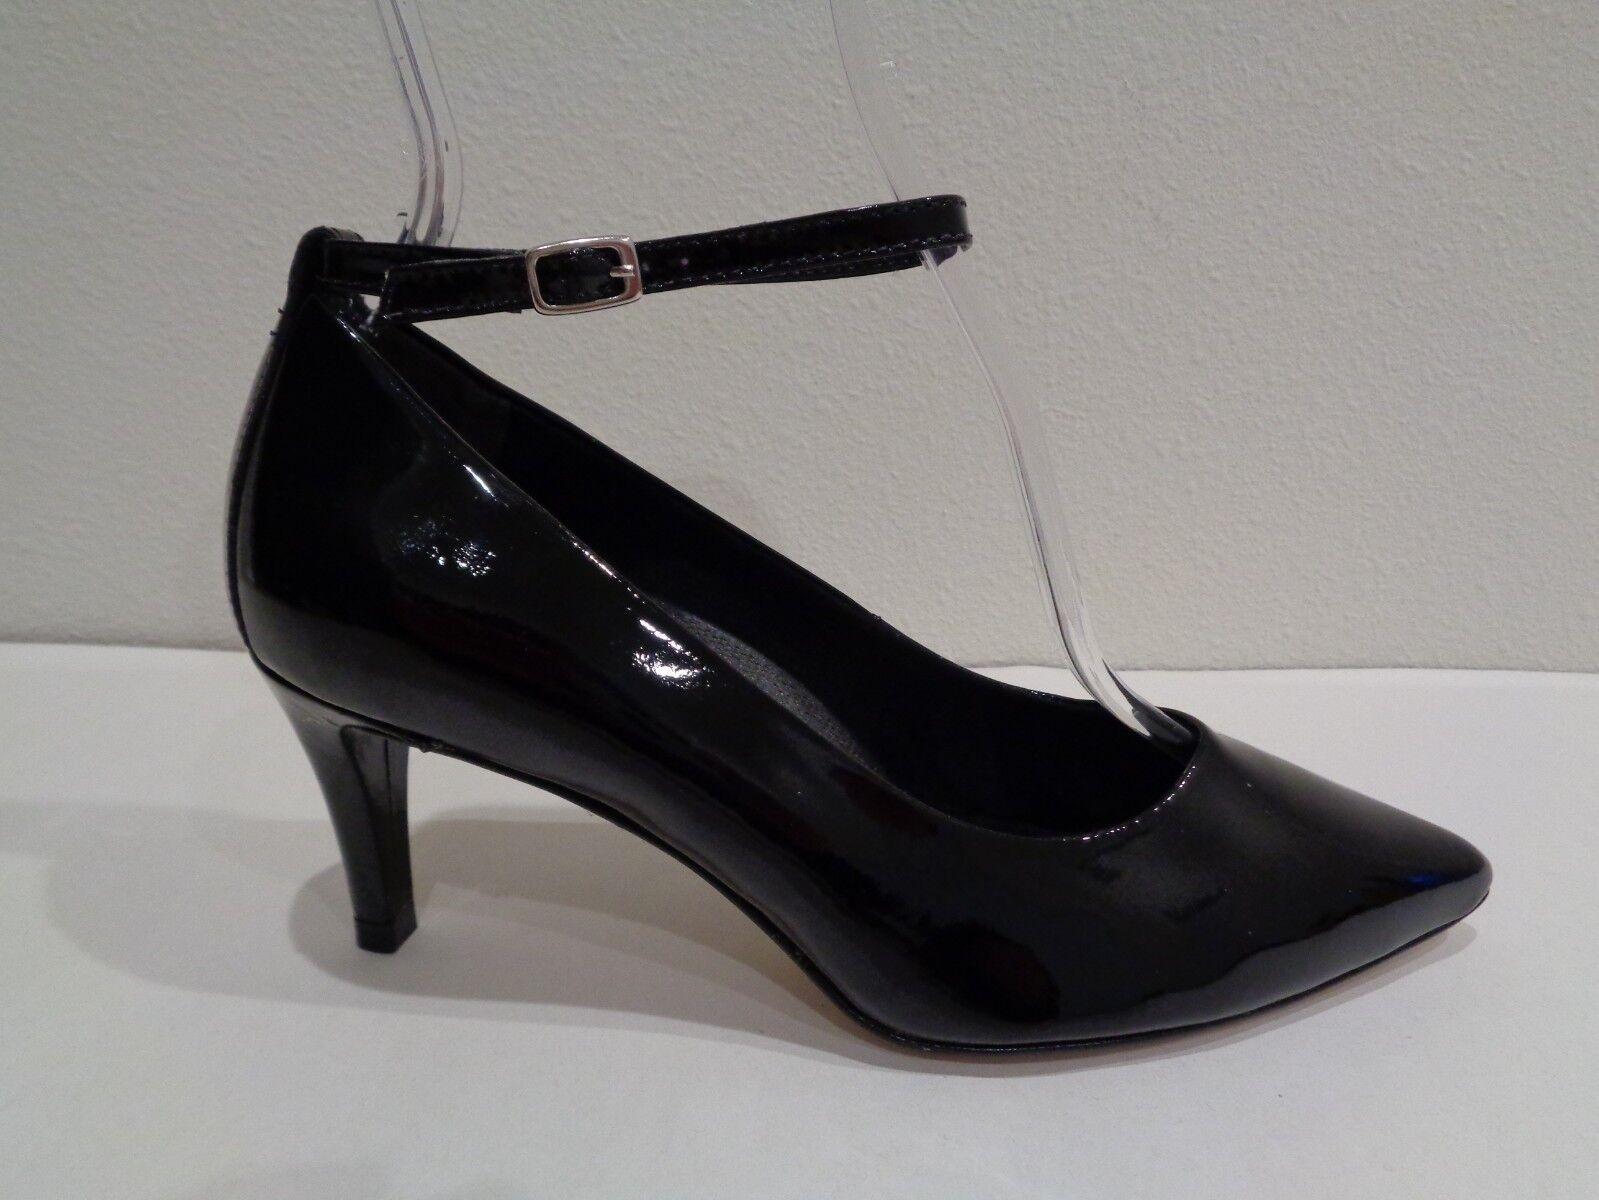 Pumps Womens Cradles Shoes Walking Ww Patent Heels Size Black 4e 6 Sideline 7vmgIbf6Yy